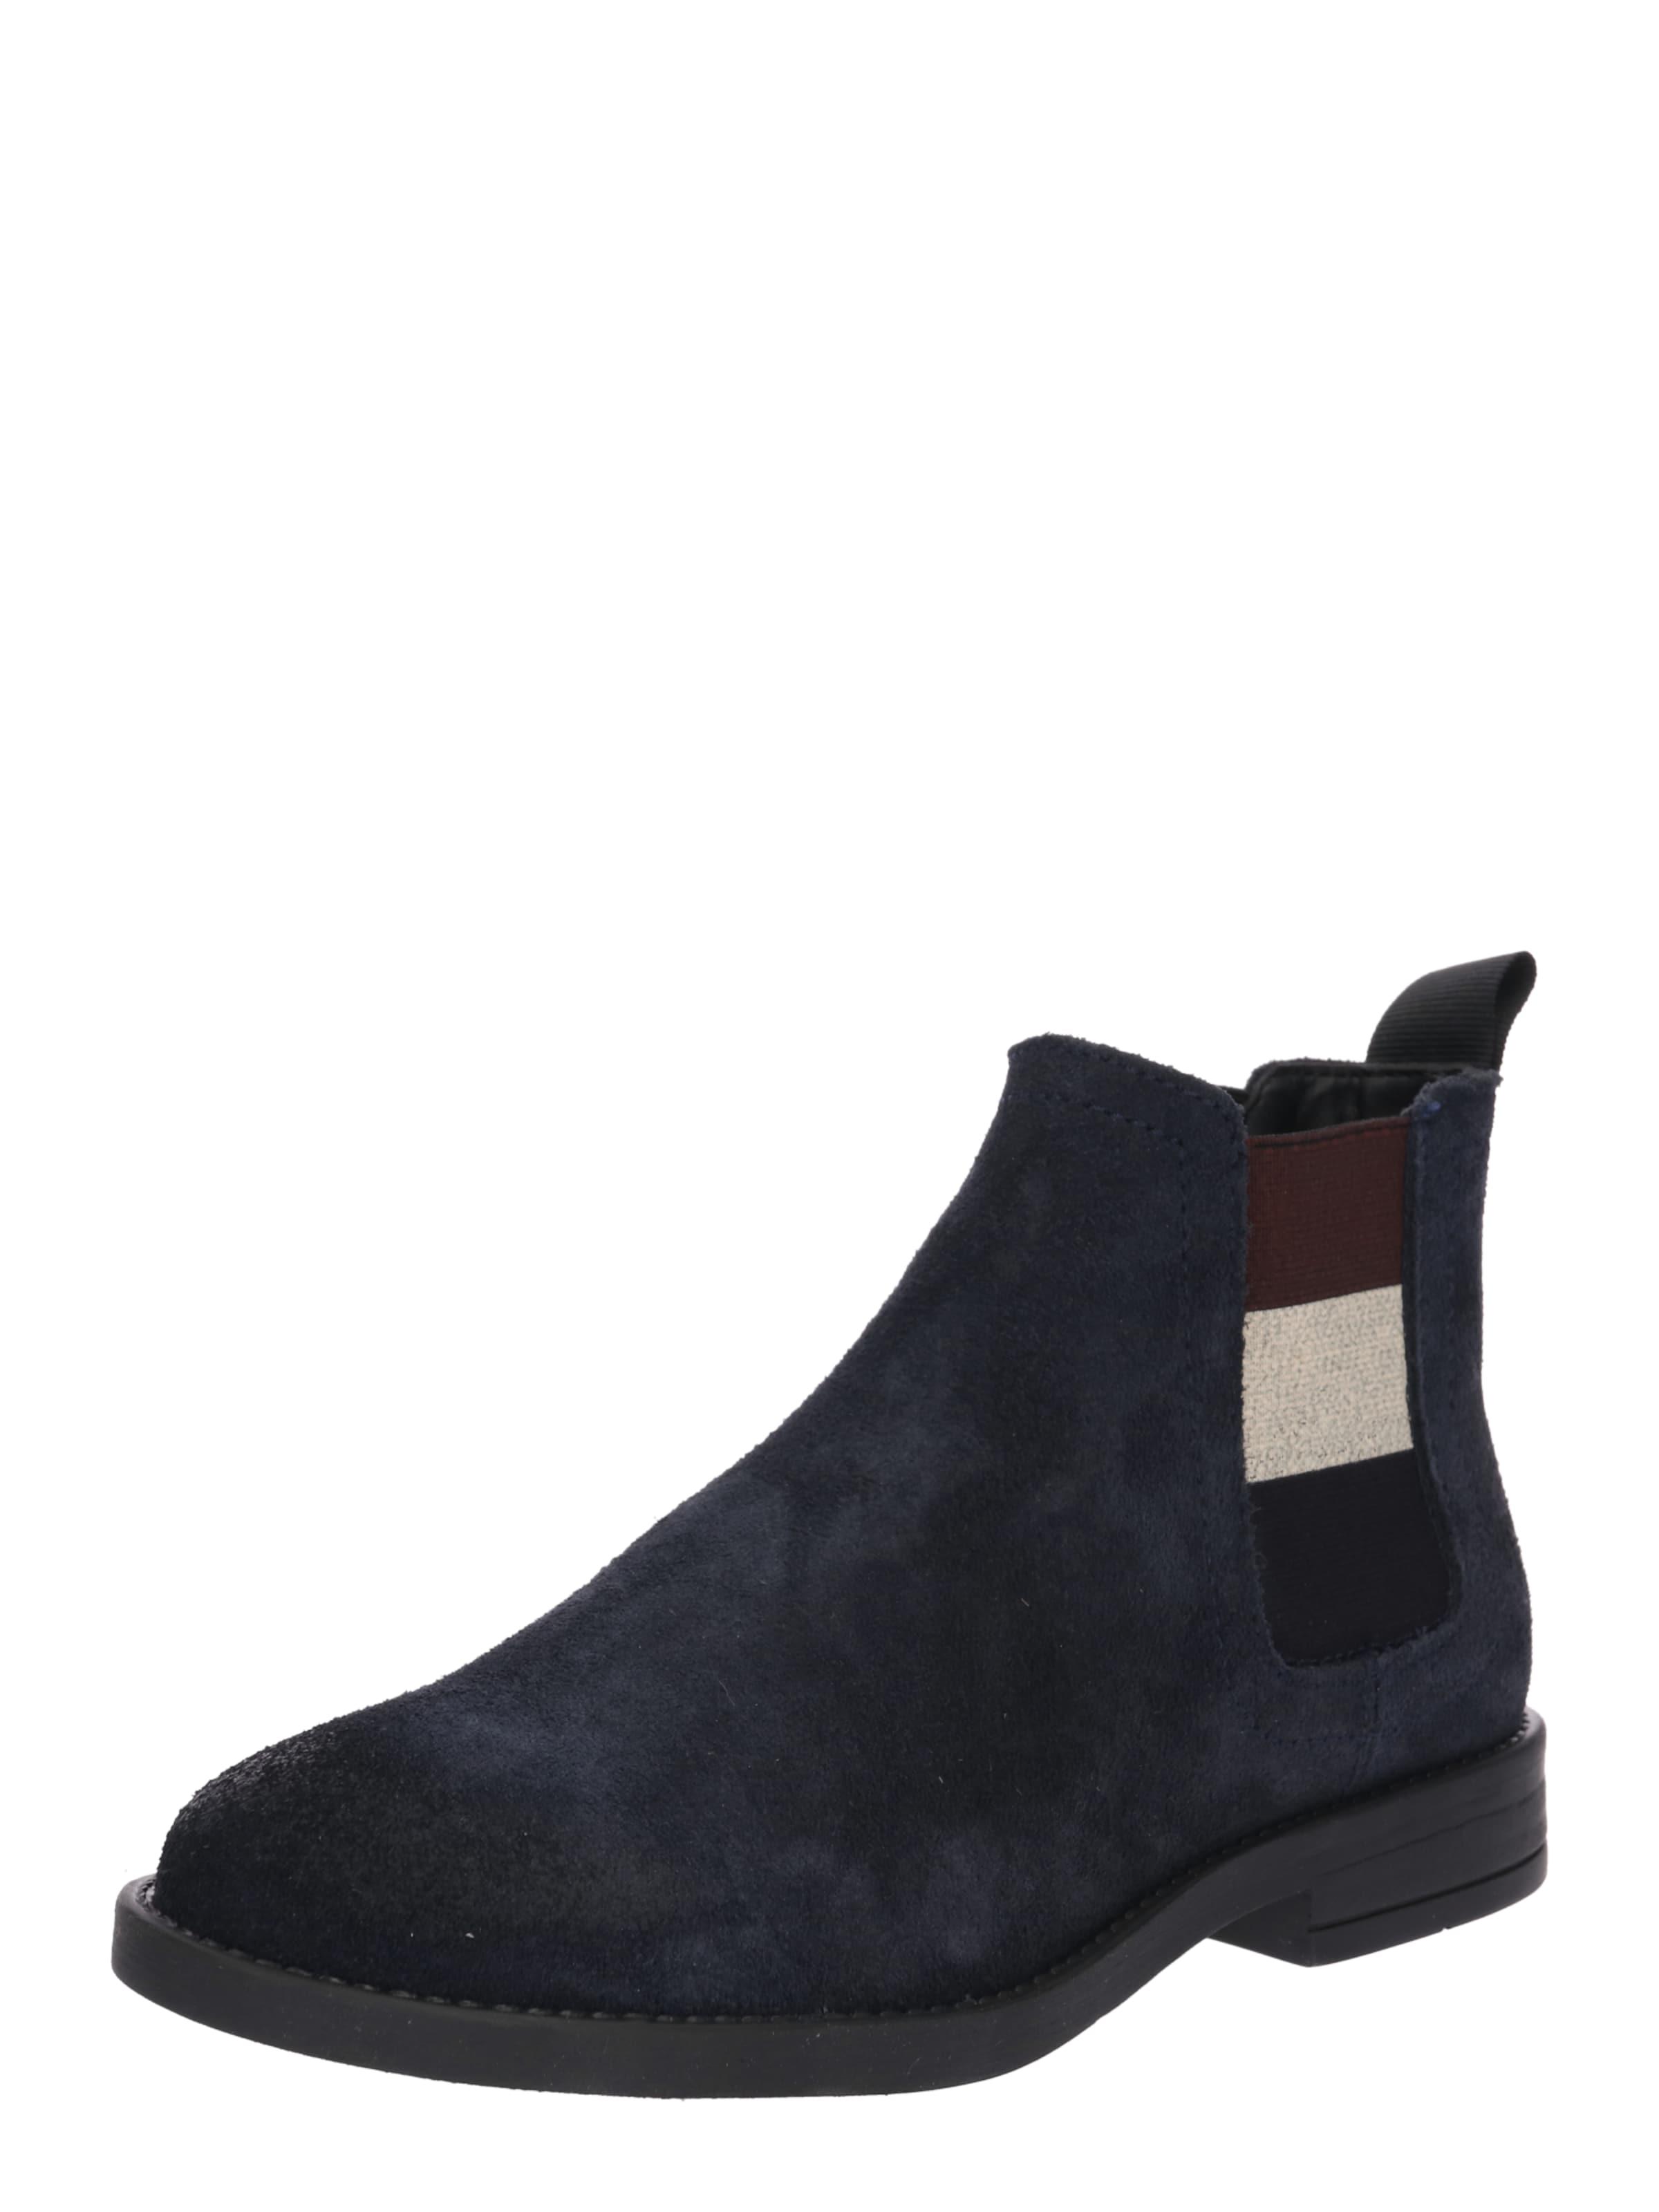 Haltbare Mode billige Chelsea-Boot Schuhe Tommy Jeans | Chelsea-Boot billige 'ESSENTIAL' Schuhe Gut getragene Schuhe 016401